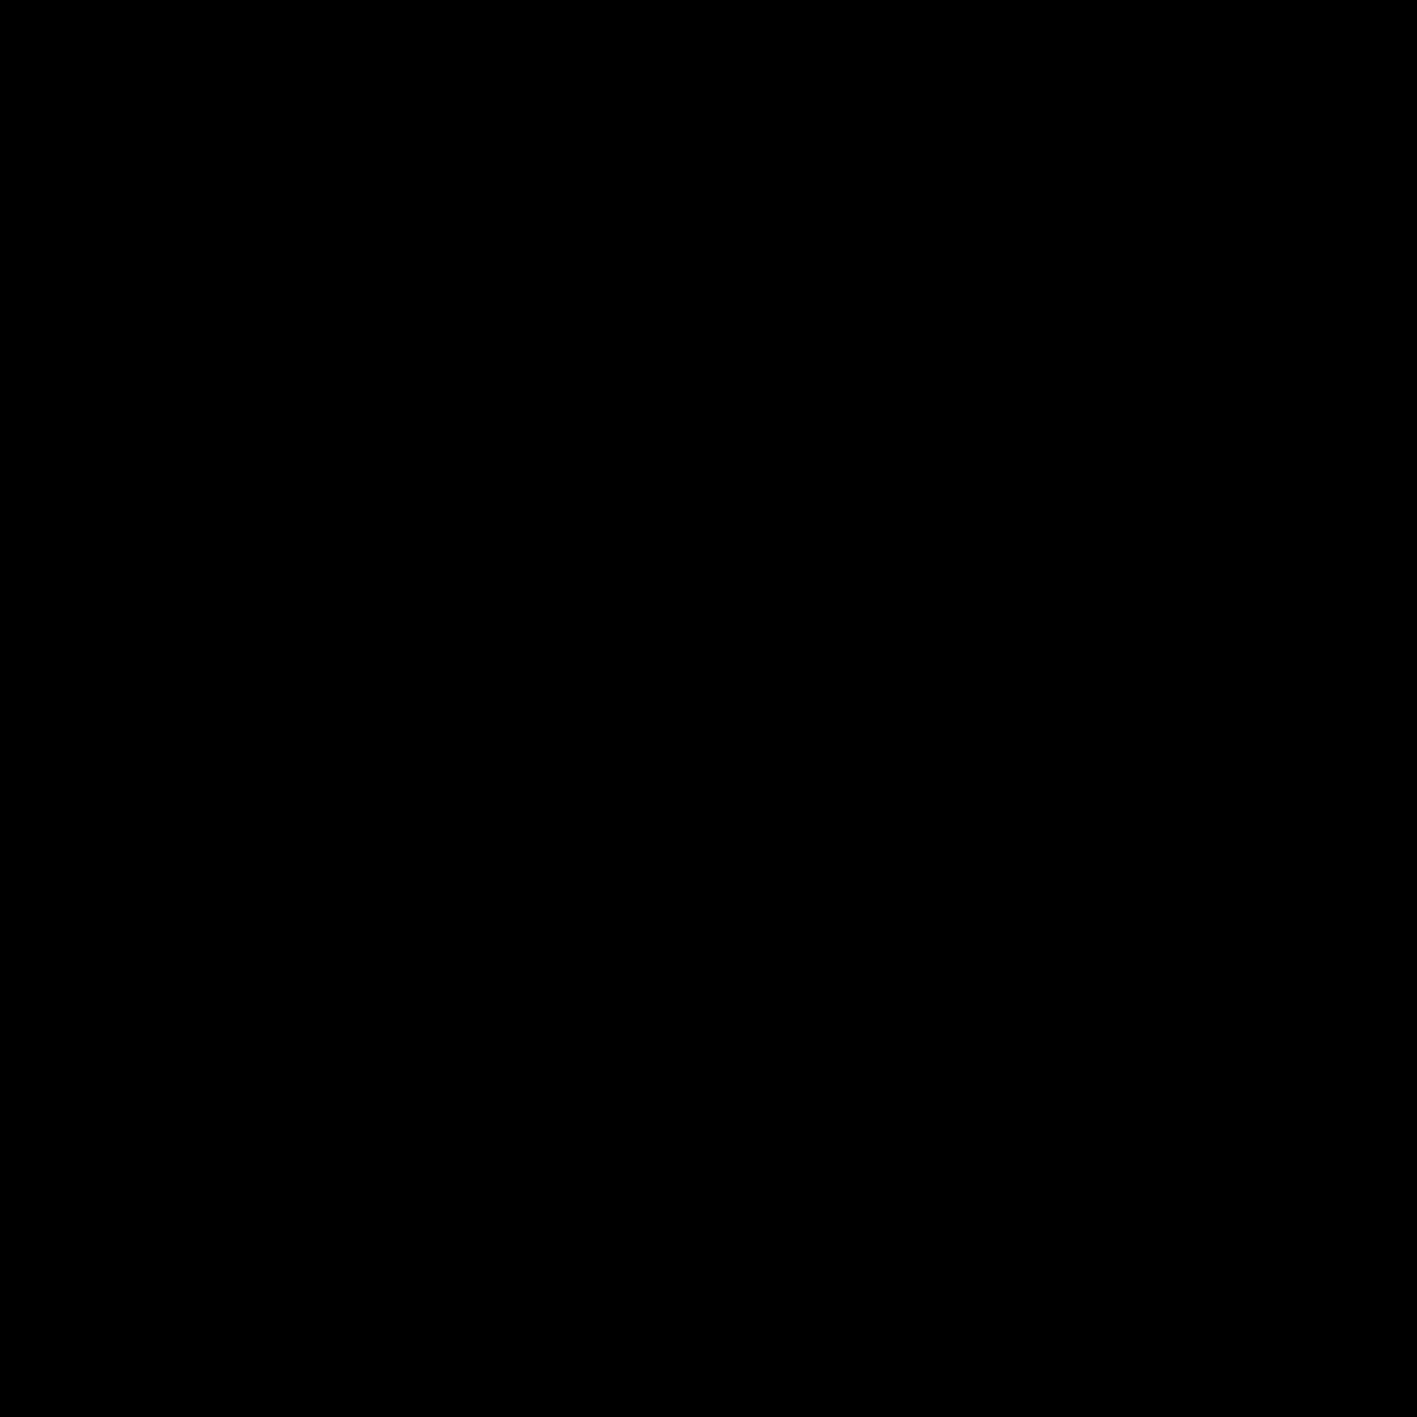 Islamic Logo Collection: Bismillah Images Collection